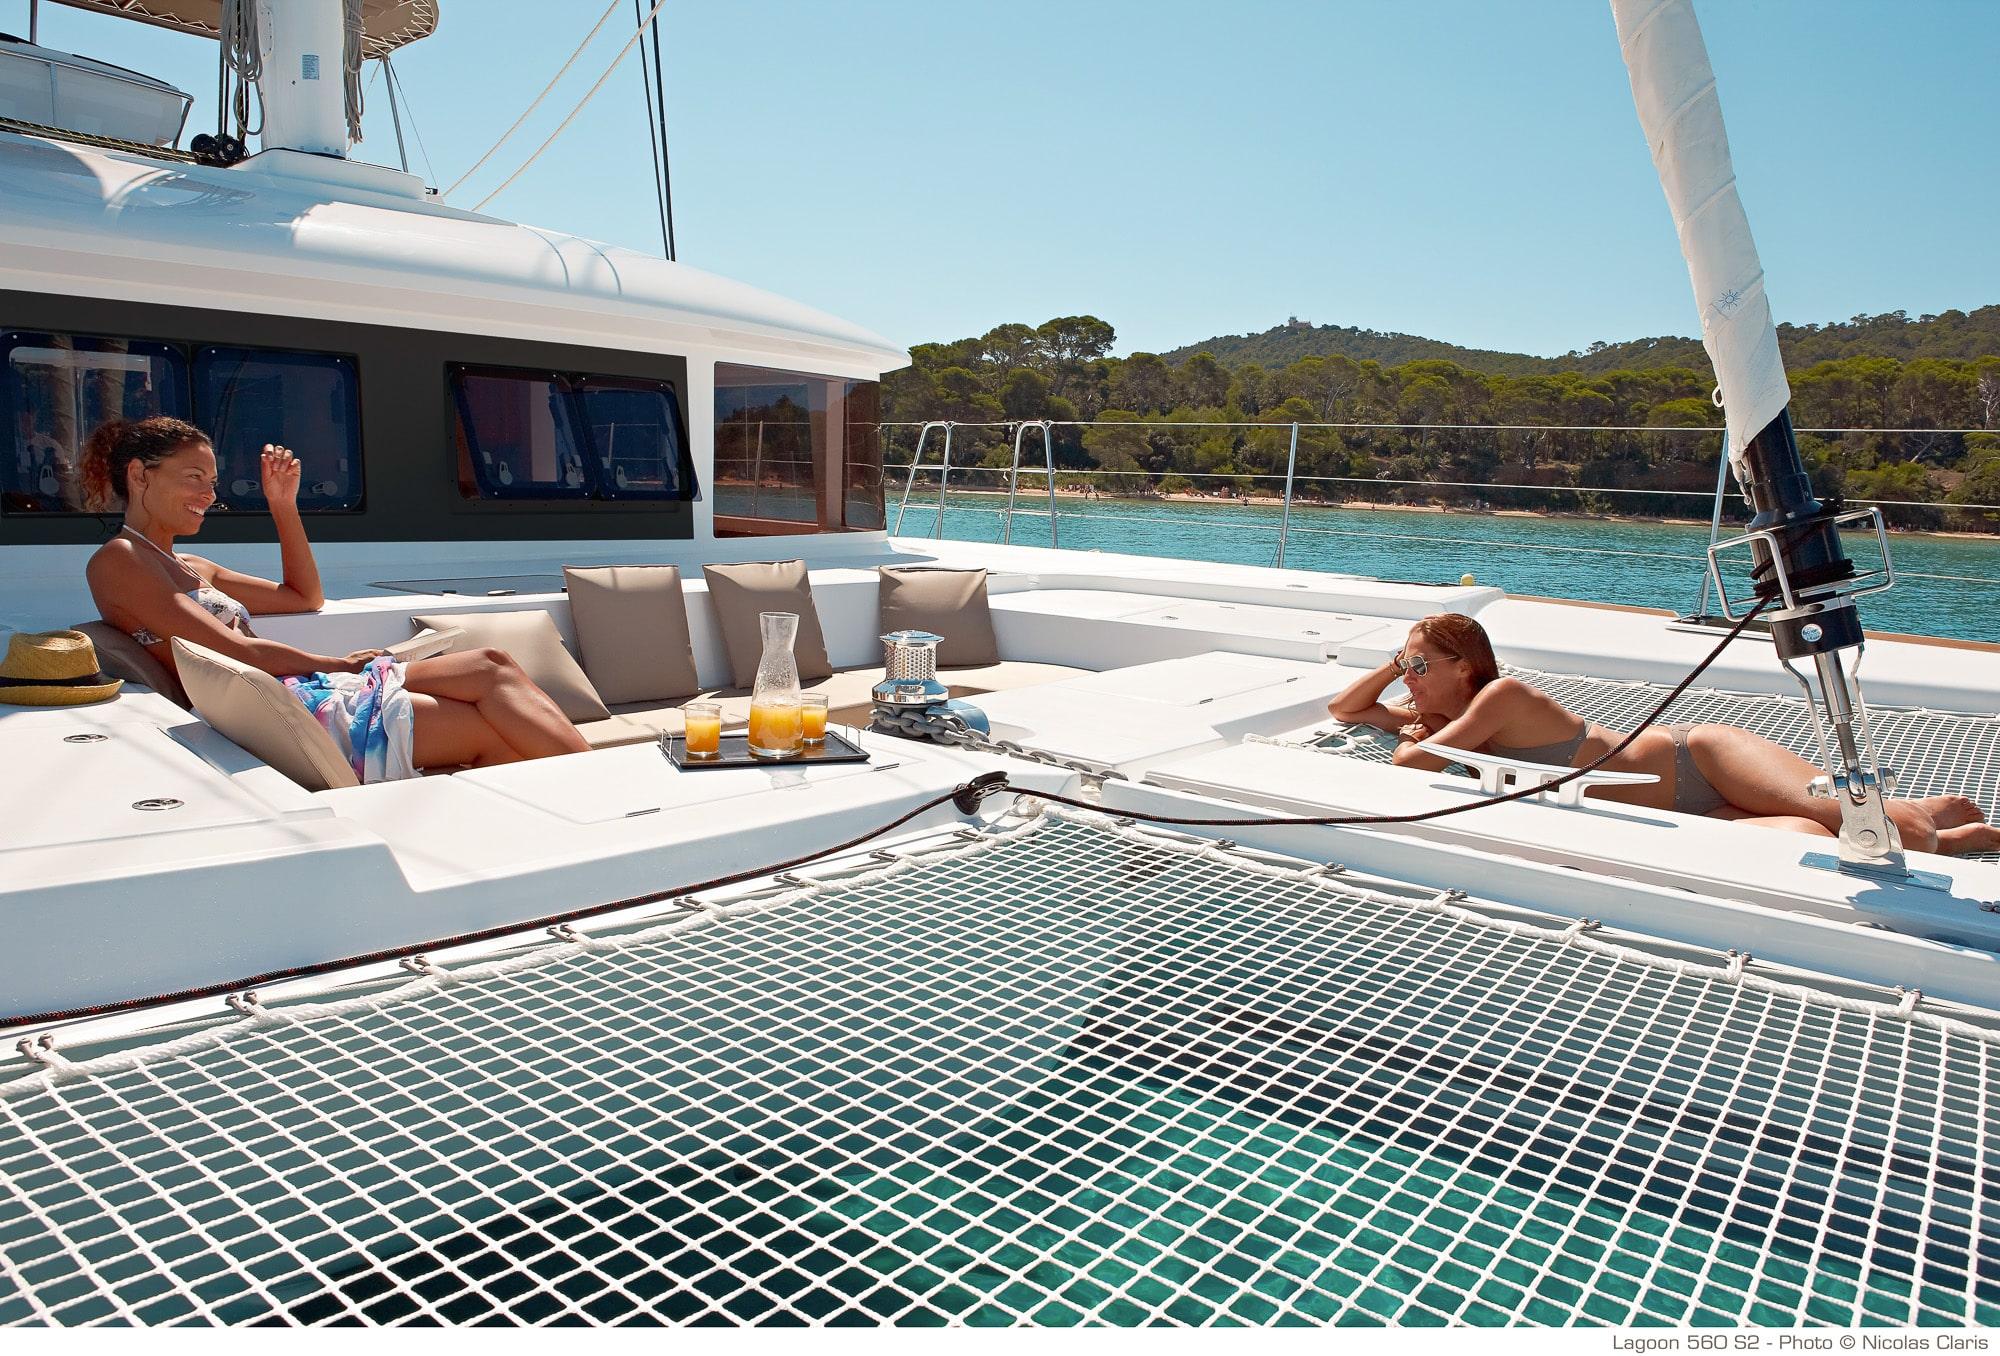 lagoon 560-yacht-charter-croatia-sailing-holidays-croatia-booking-yacht-charter-croatia-catamarans-sailboats-motorboats-gulets-luxury-yachts-boat-rental-croatia 5